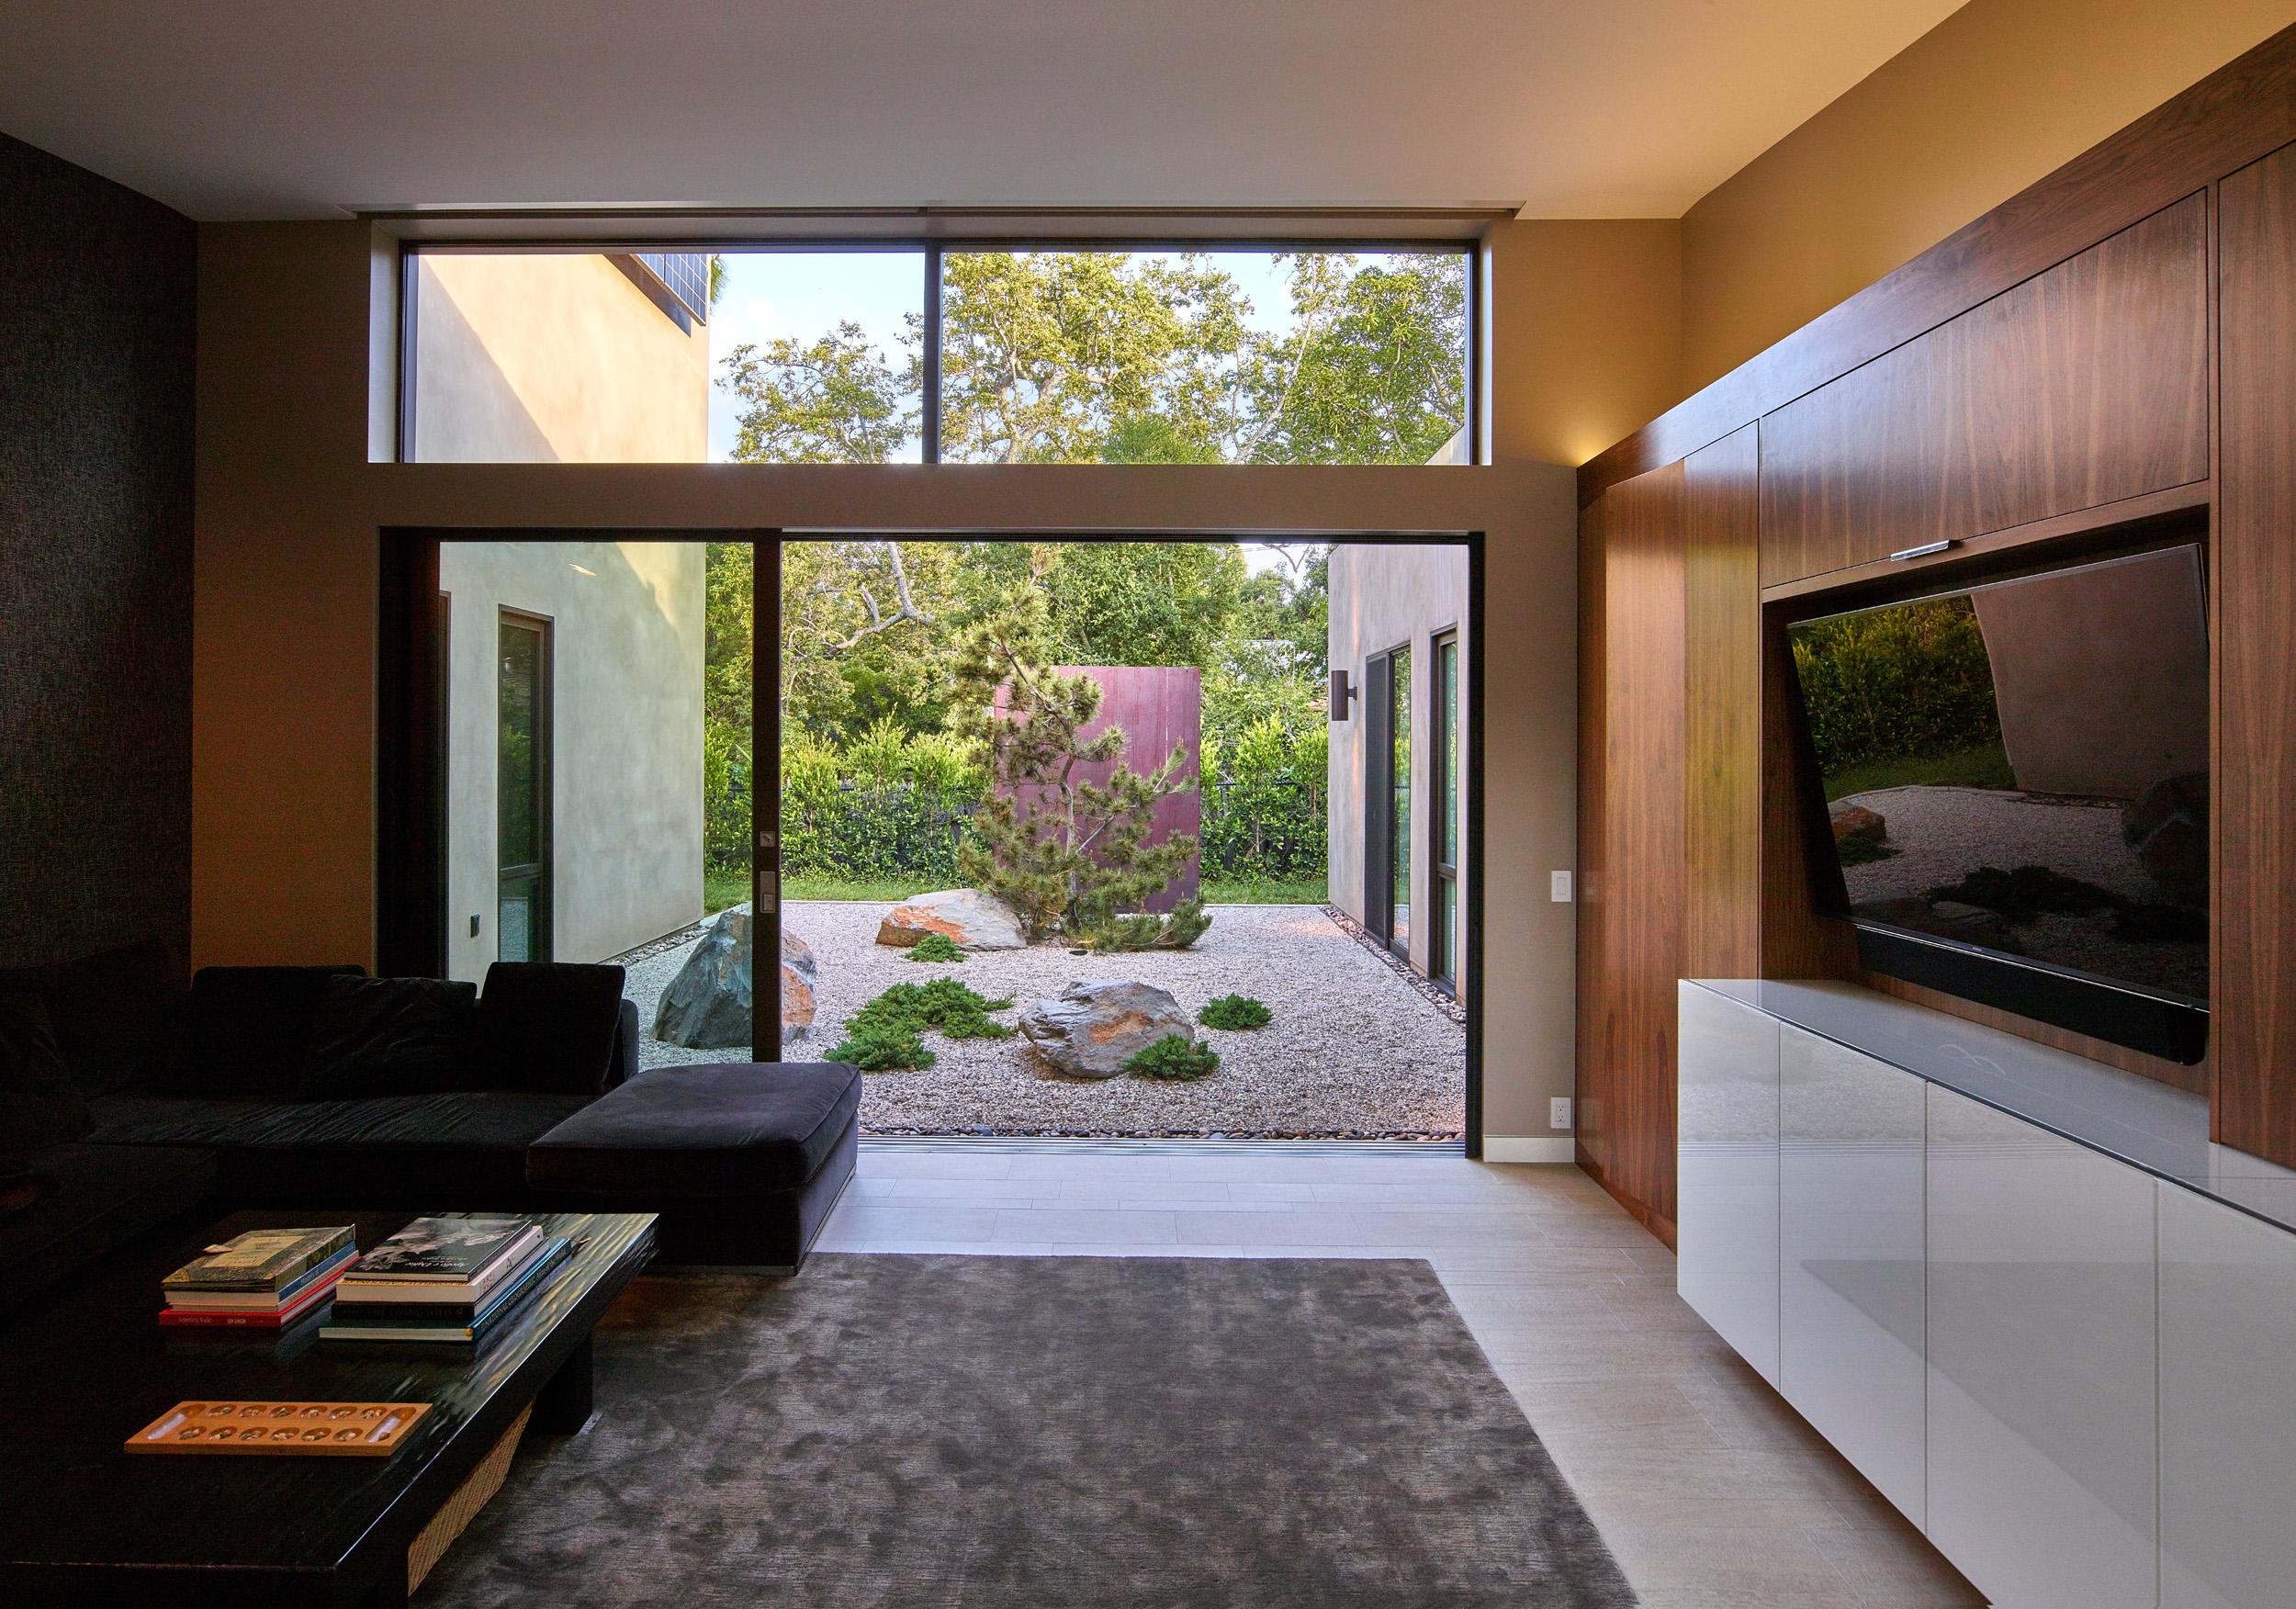 Mandeville house - Den looking into the Zen garden